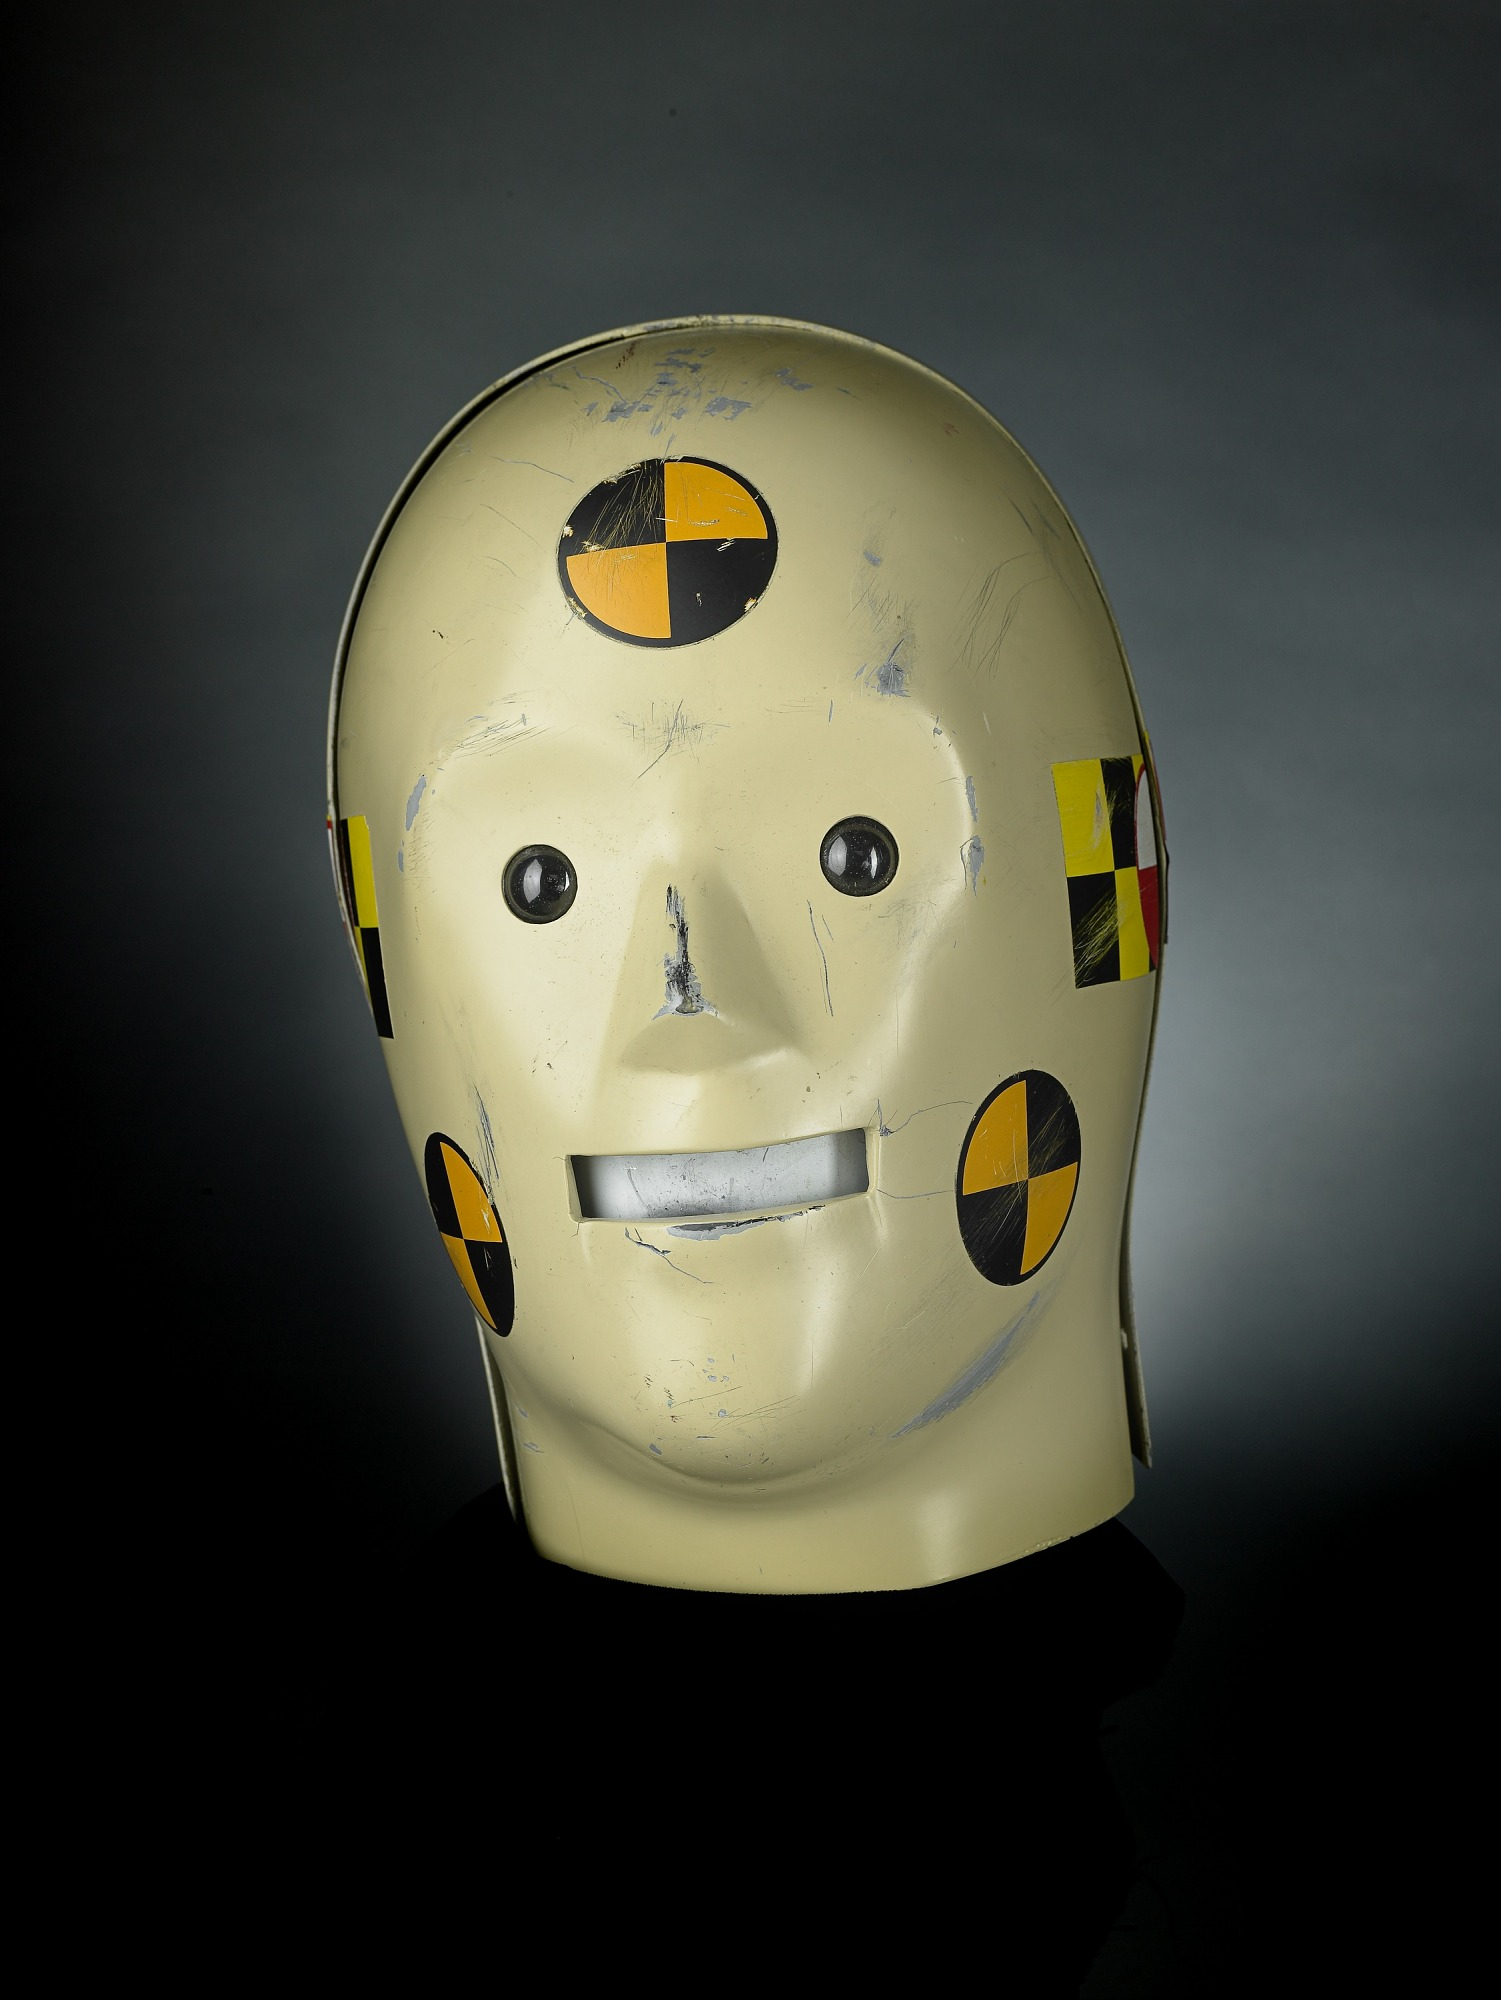 Larry Crash Dummy Costume Head, 1990s